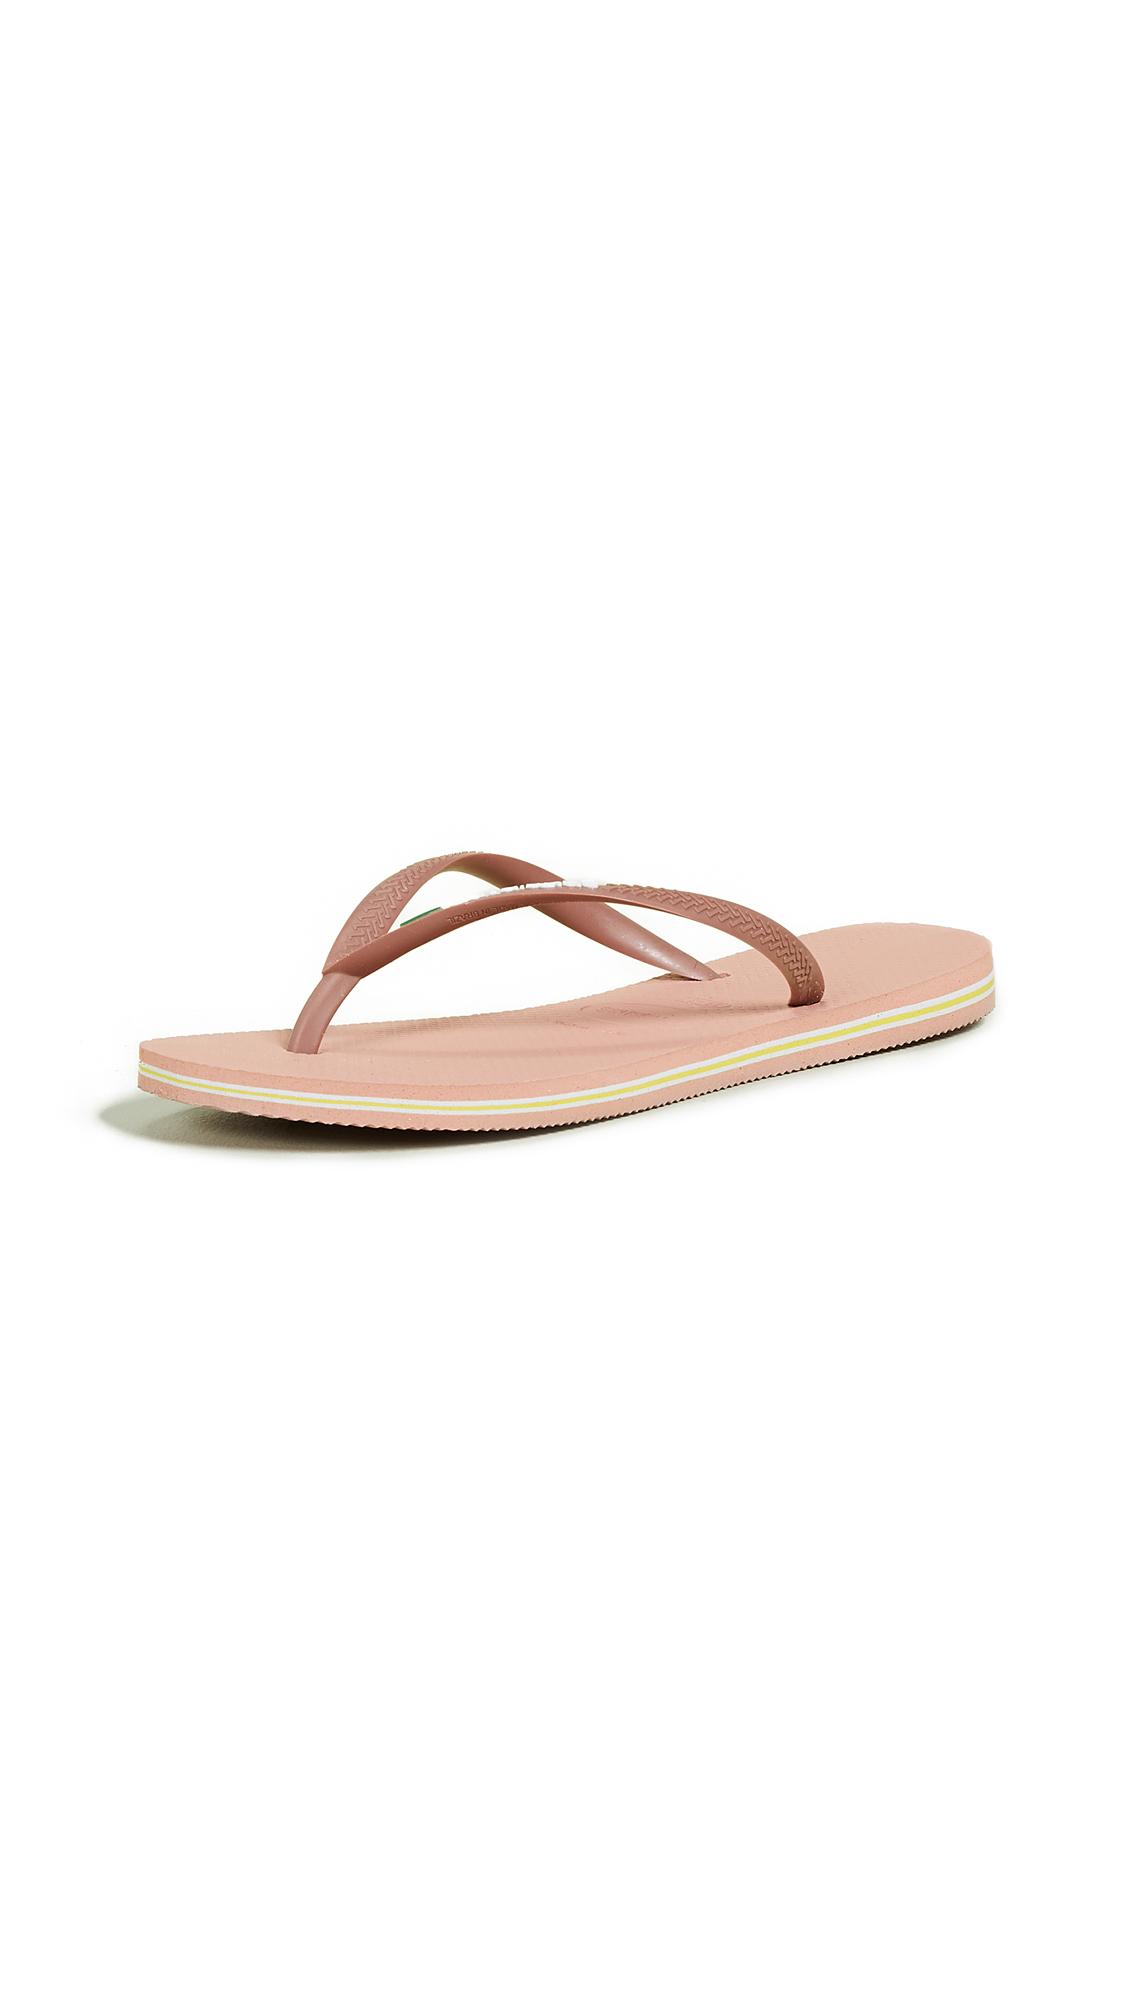 Havaianas Slim Brazil Flip Flops - Rose Nude